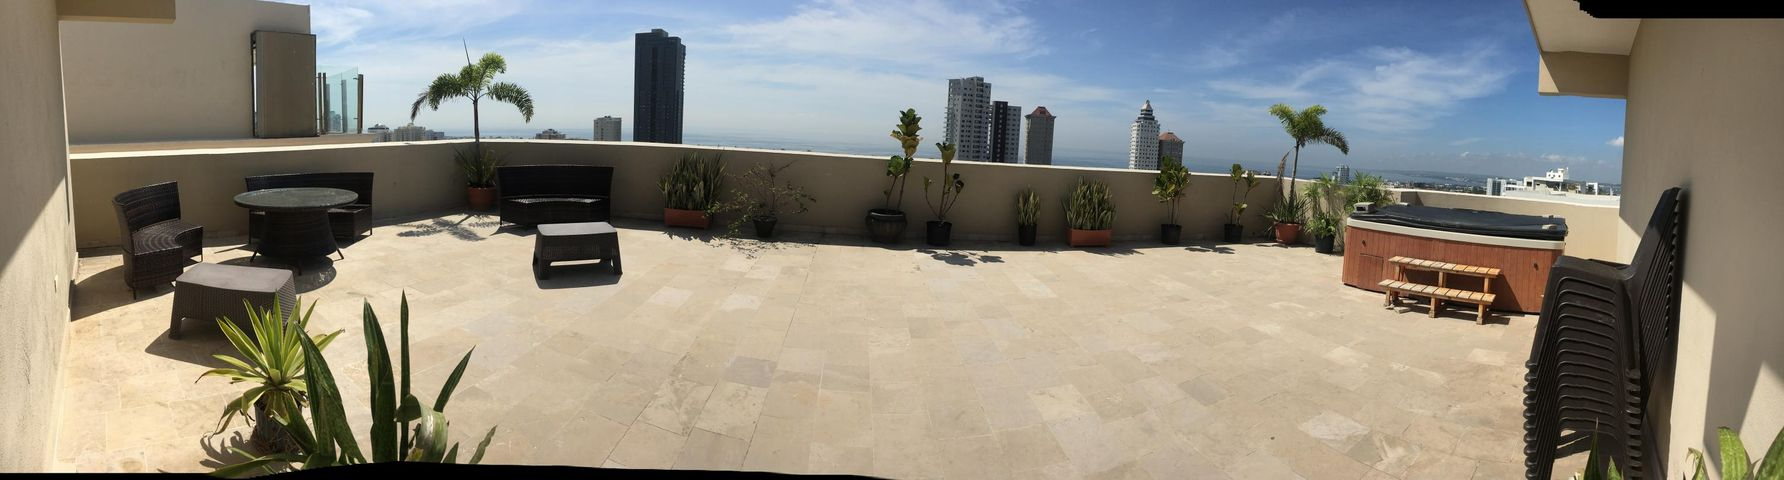 Apartamento Santo Domingo>Distrito Nacional>Los Cacicazgos - Alquiler:3.500 Dolares - codigo: 18-319